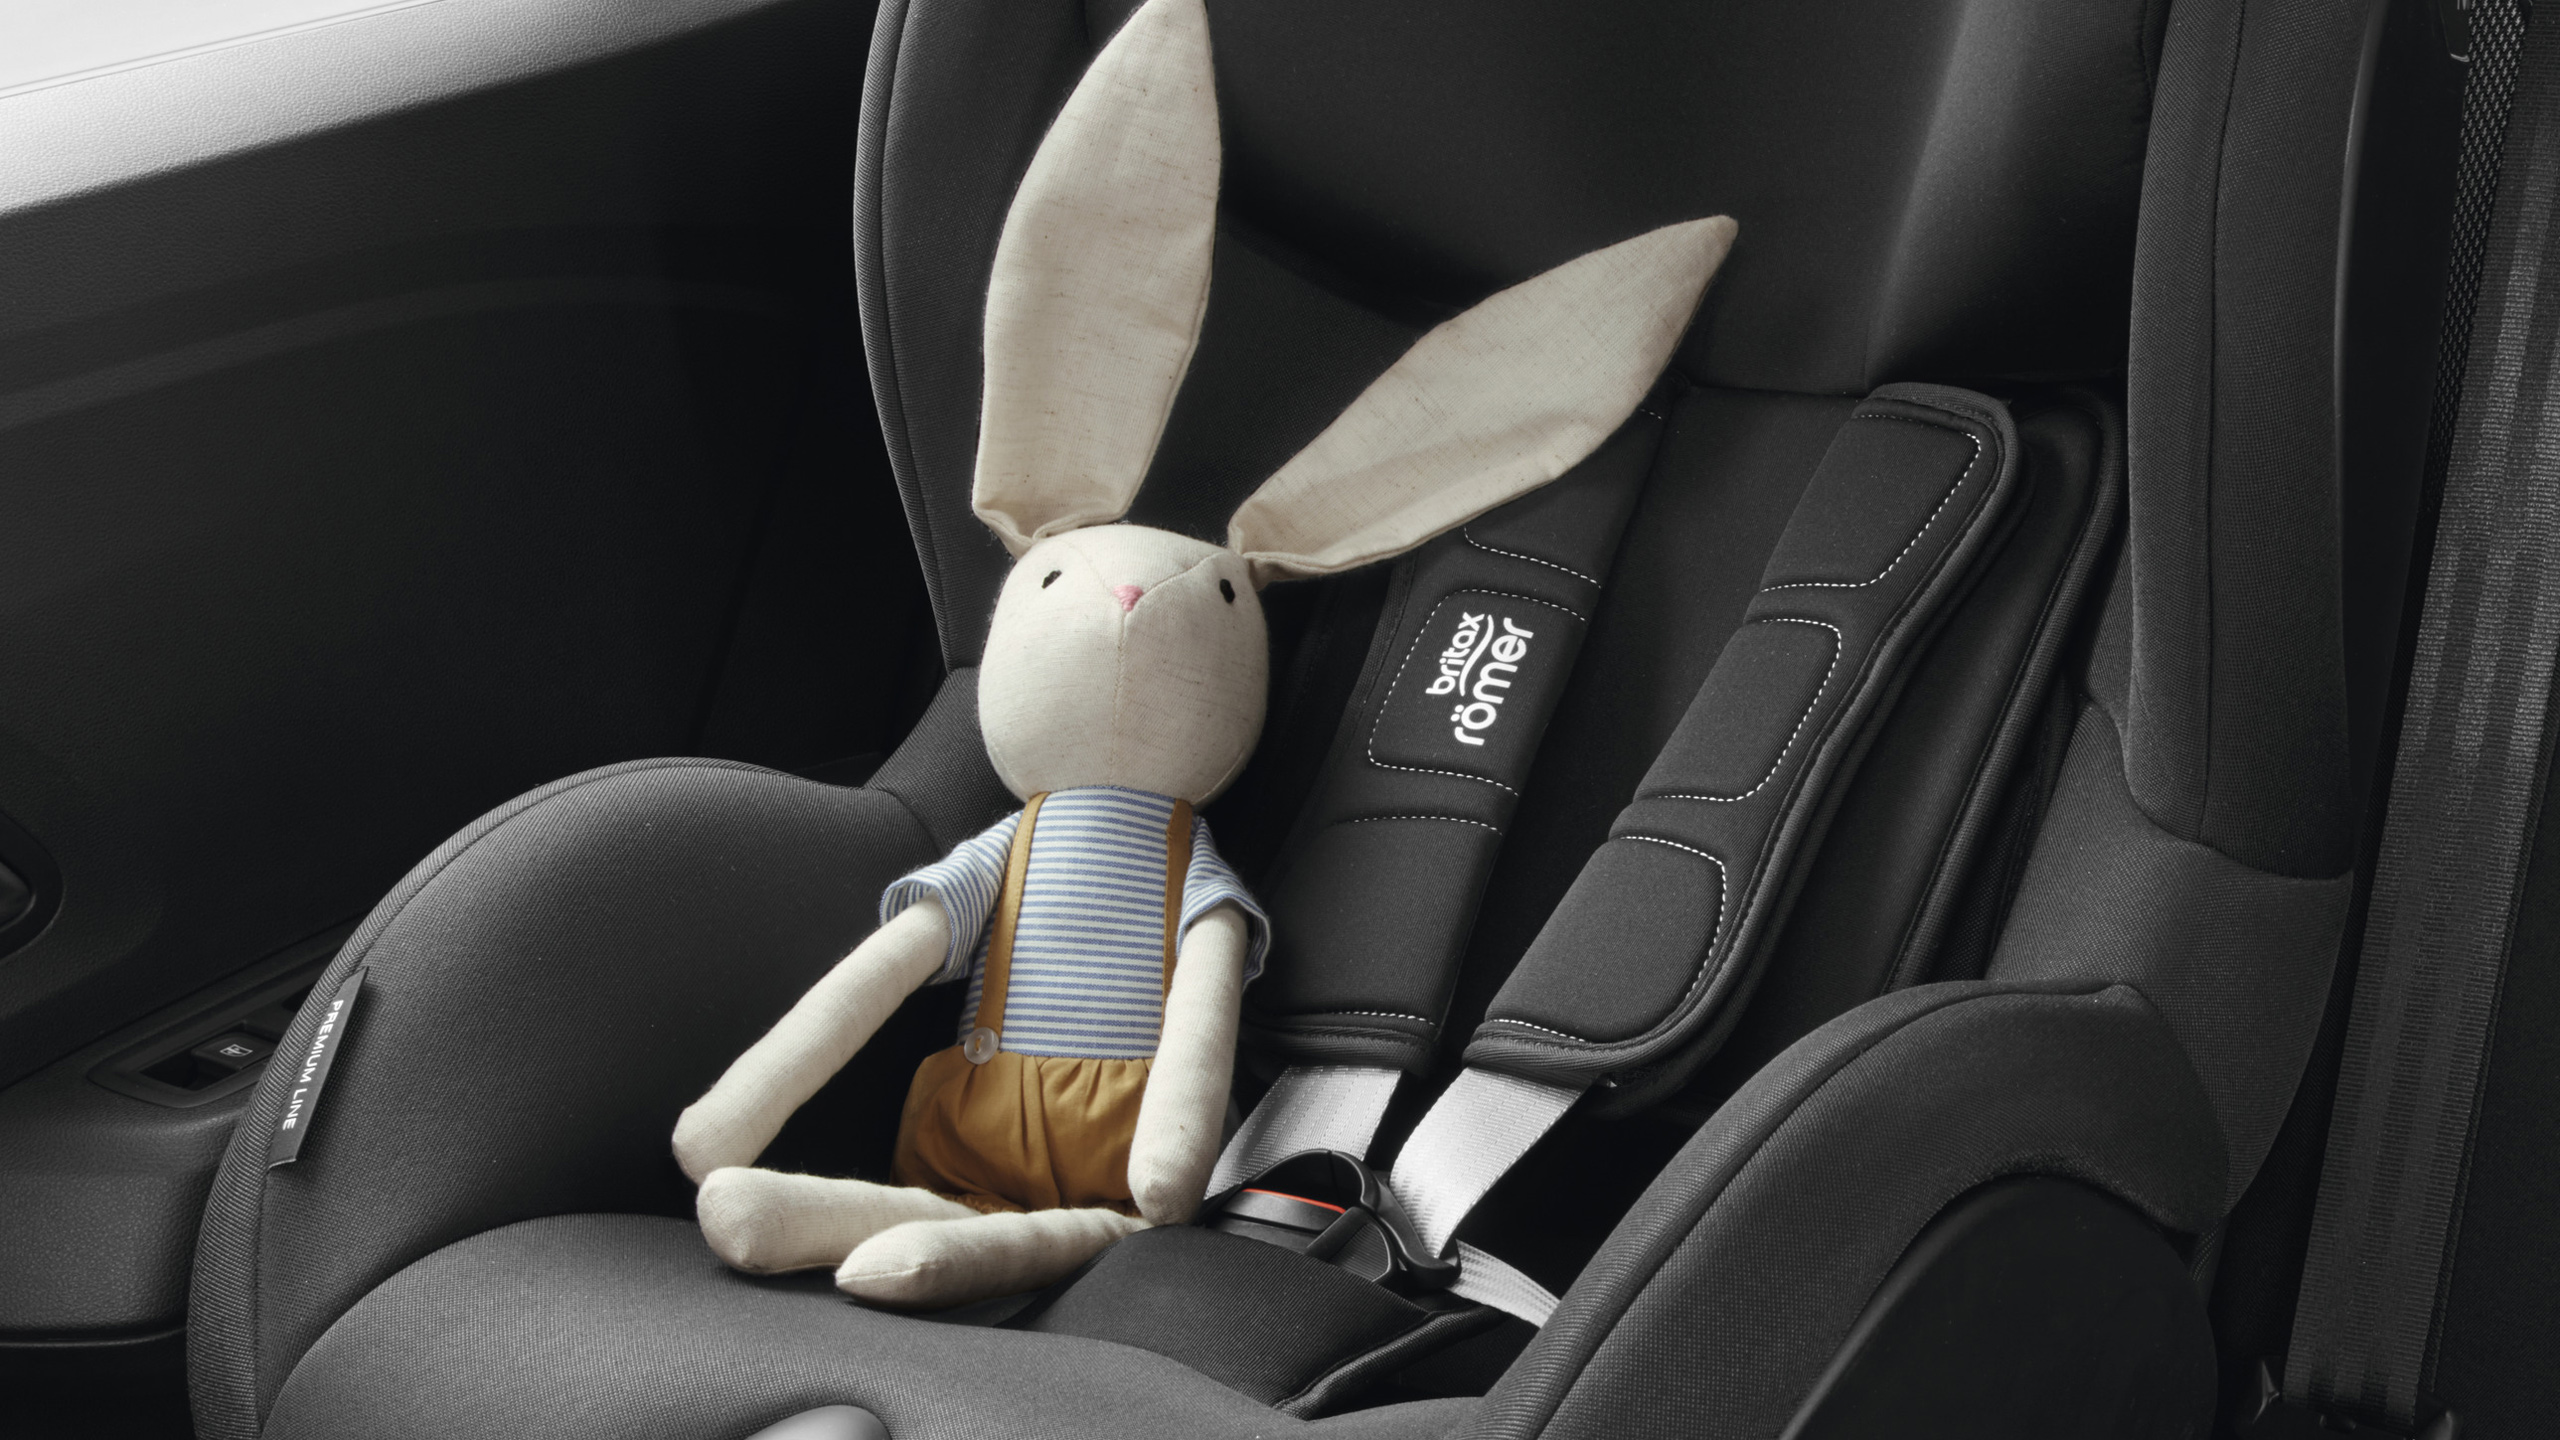 Isofix-Kindersitzbefestigungssystem